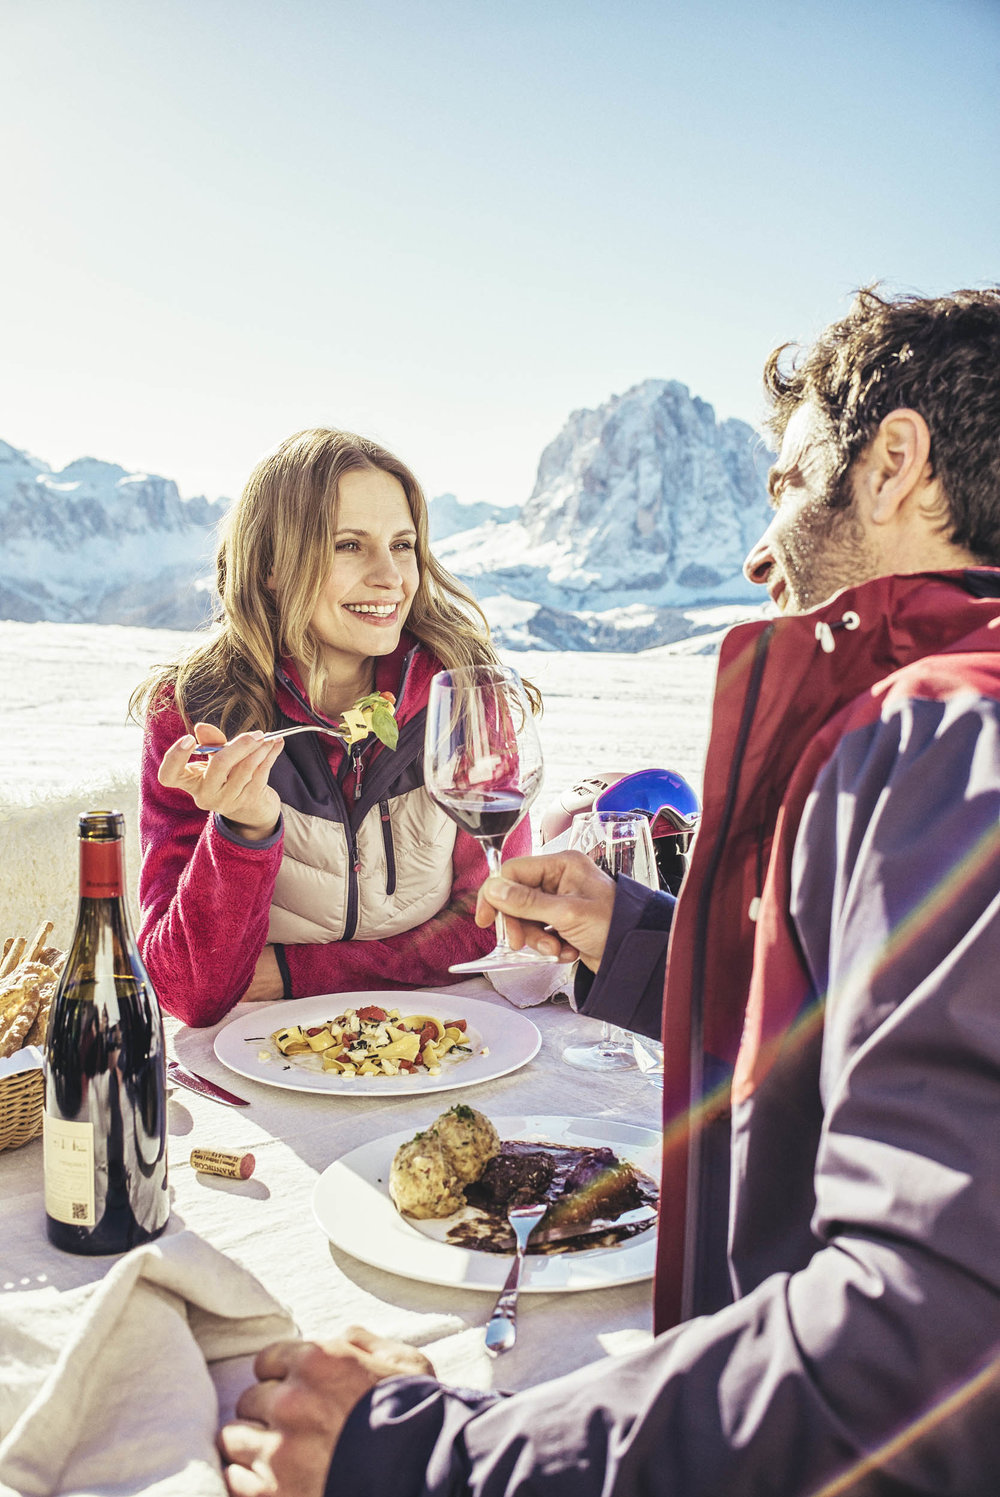 seifertuebler-lifestyle-suedtirol-winter-tourism-ski-dolomites03.jpg